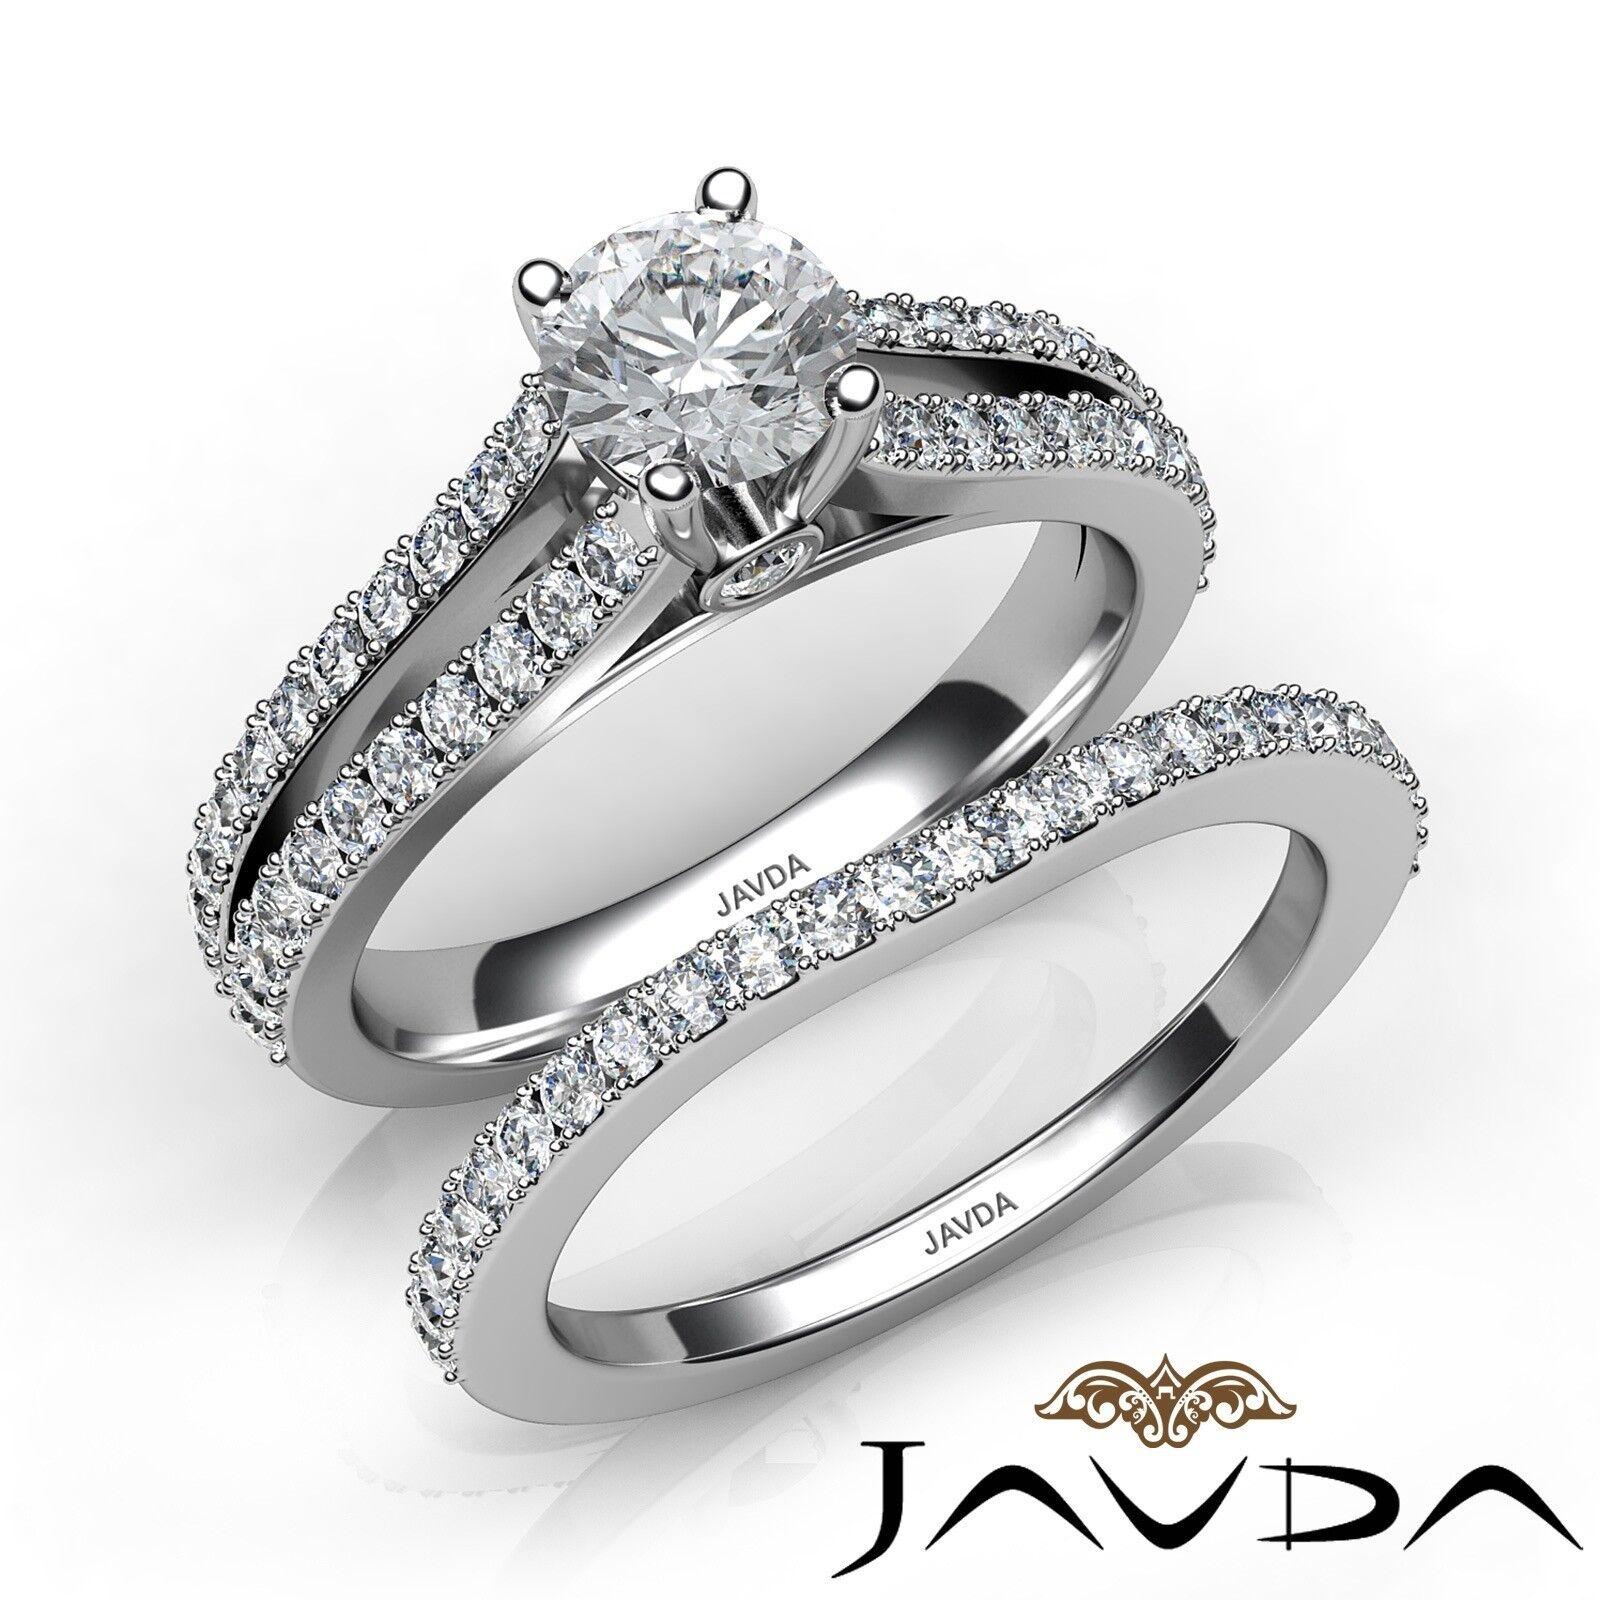 1.6ct Peekaboo Wedding Bridal Set Round Diamond Engagement Ring GIA G-VS2 W Gold